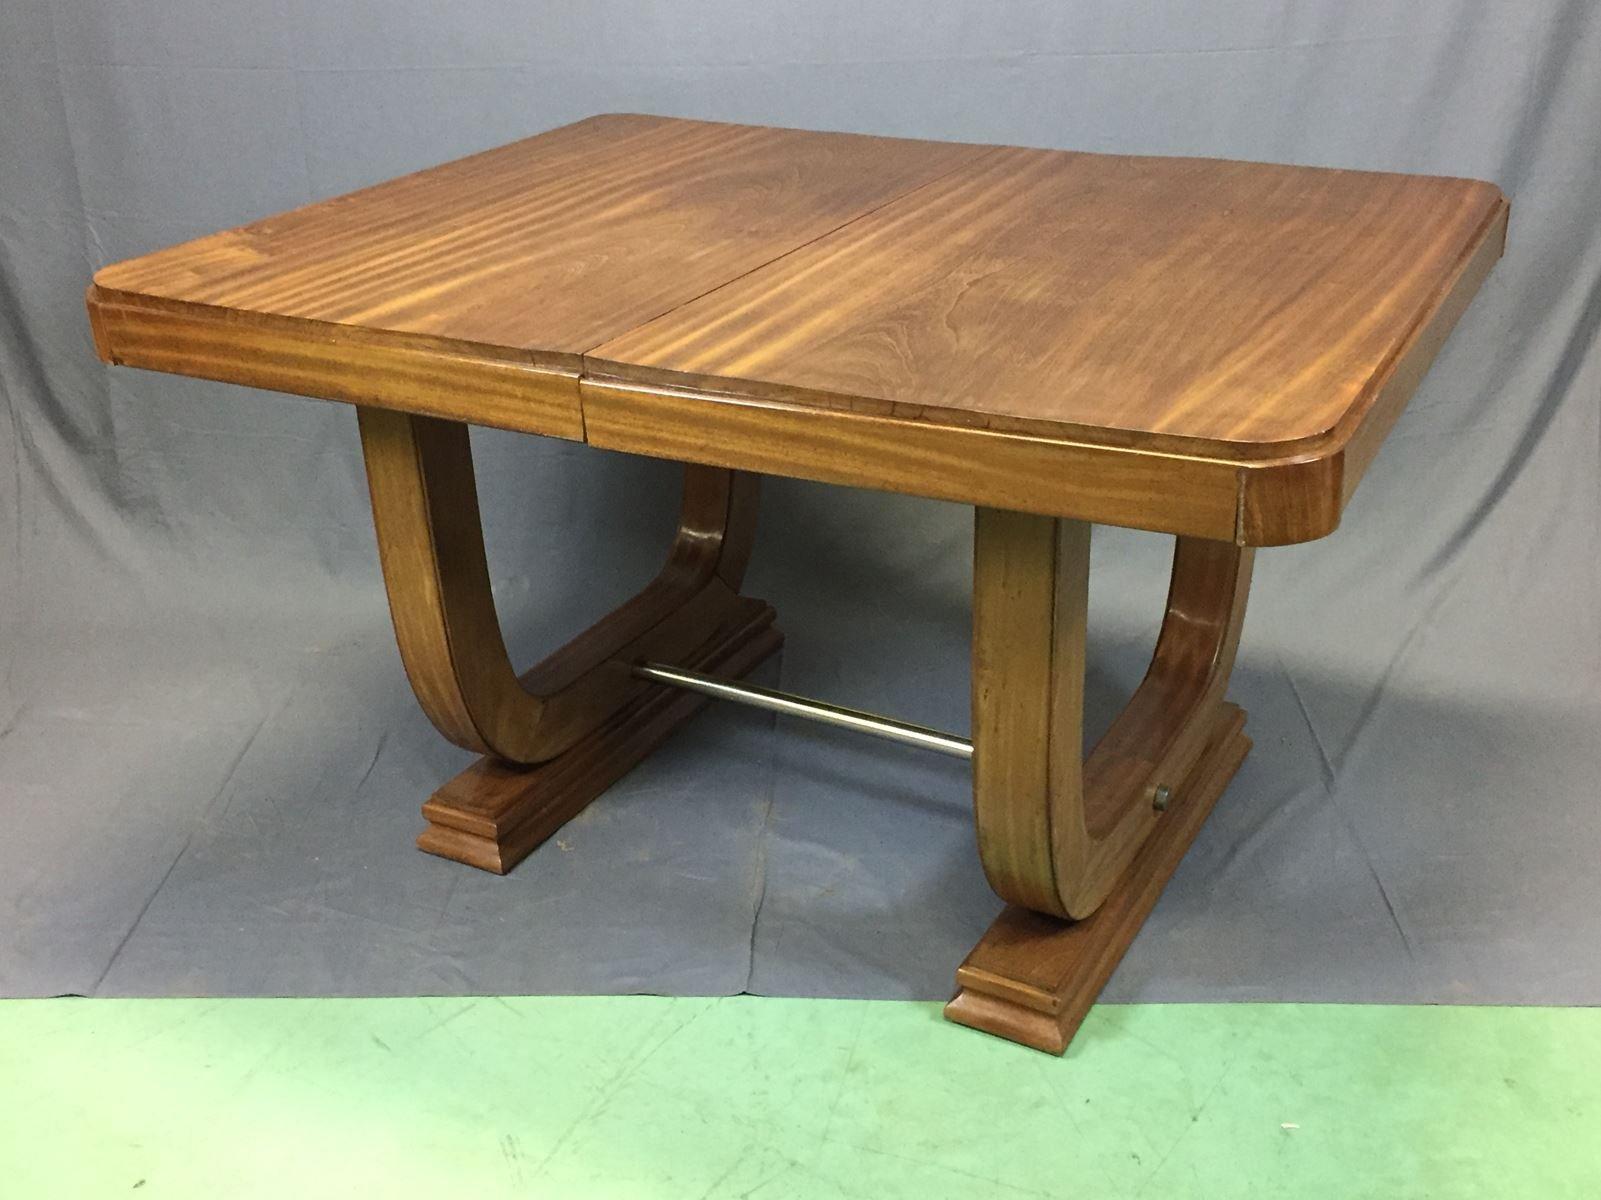 Art Deco Mahogany Table 1930s for sale at Pamono